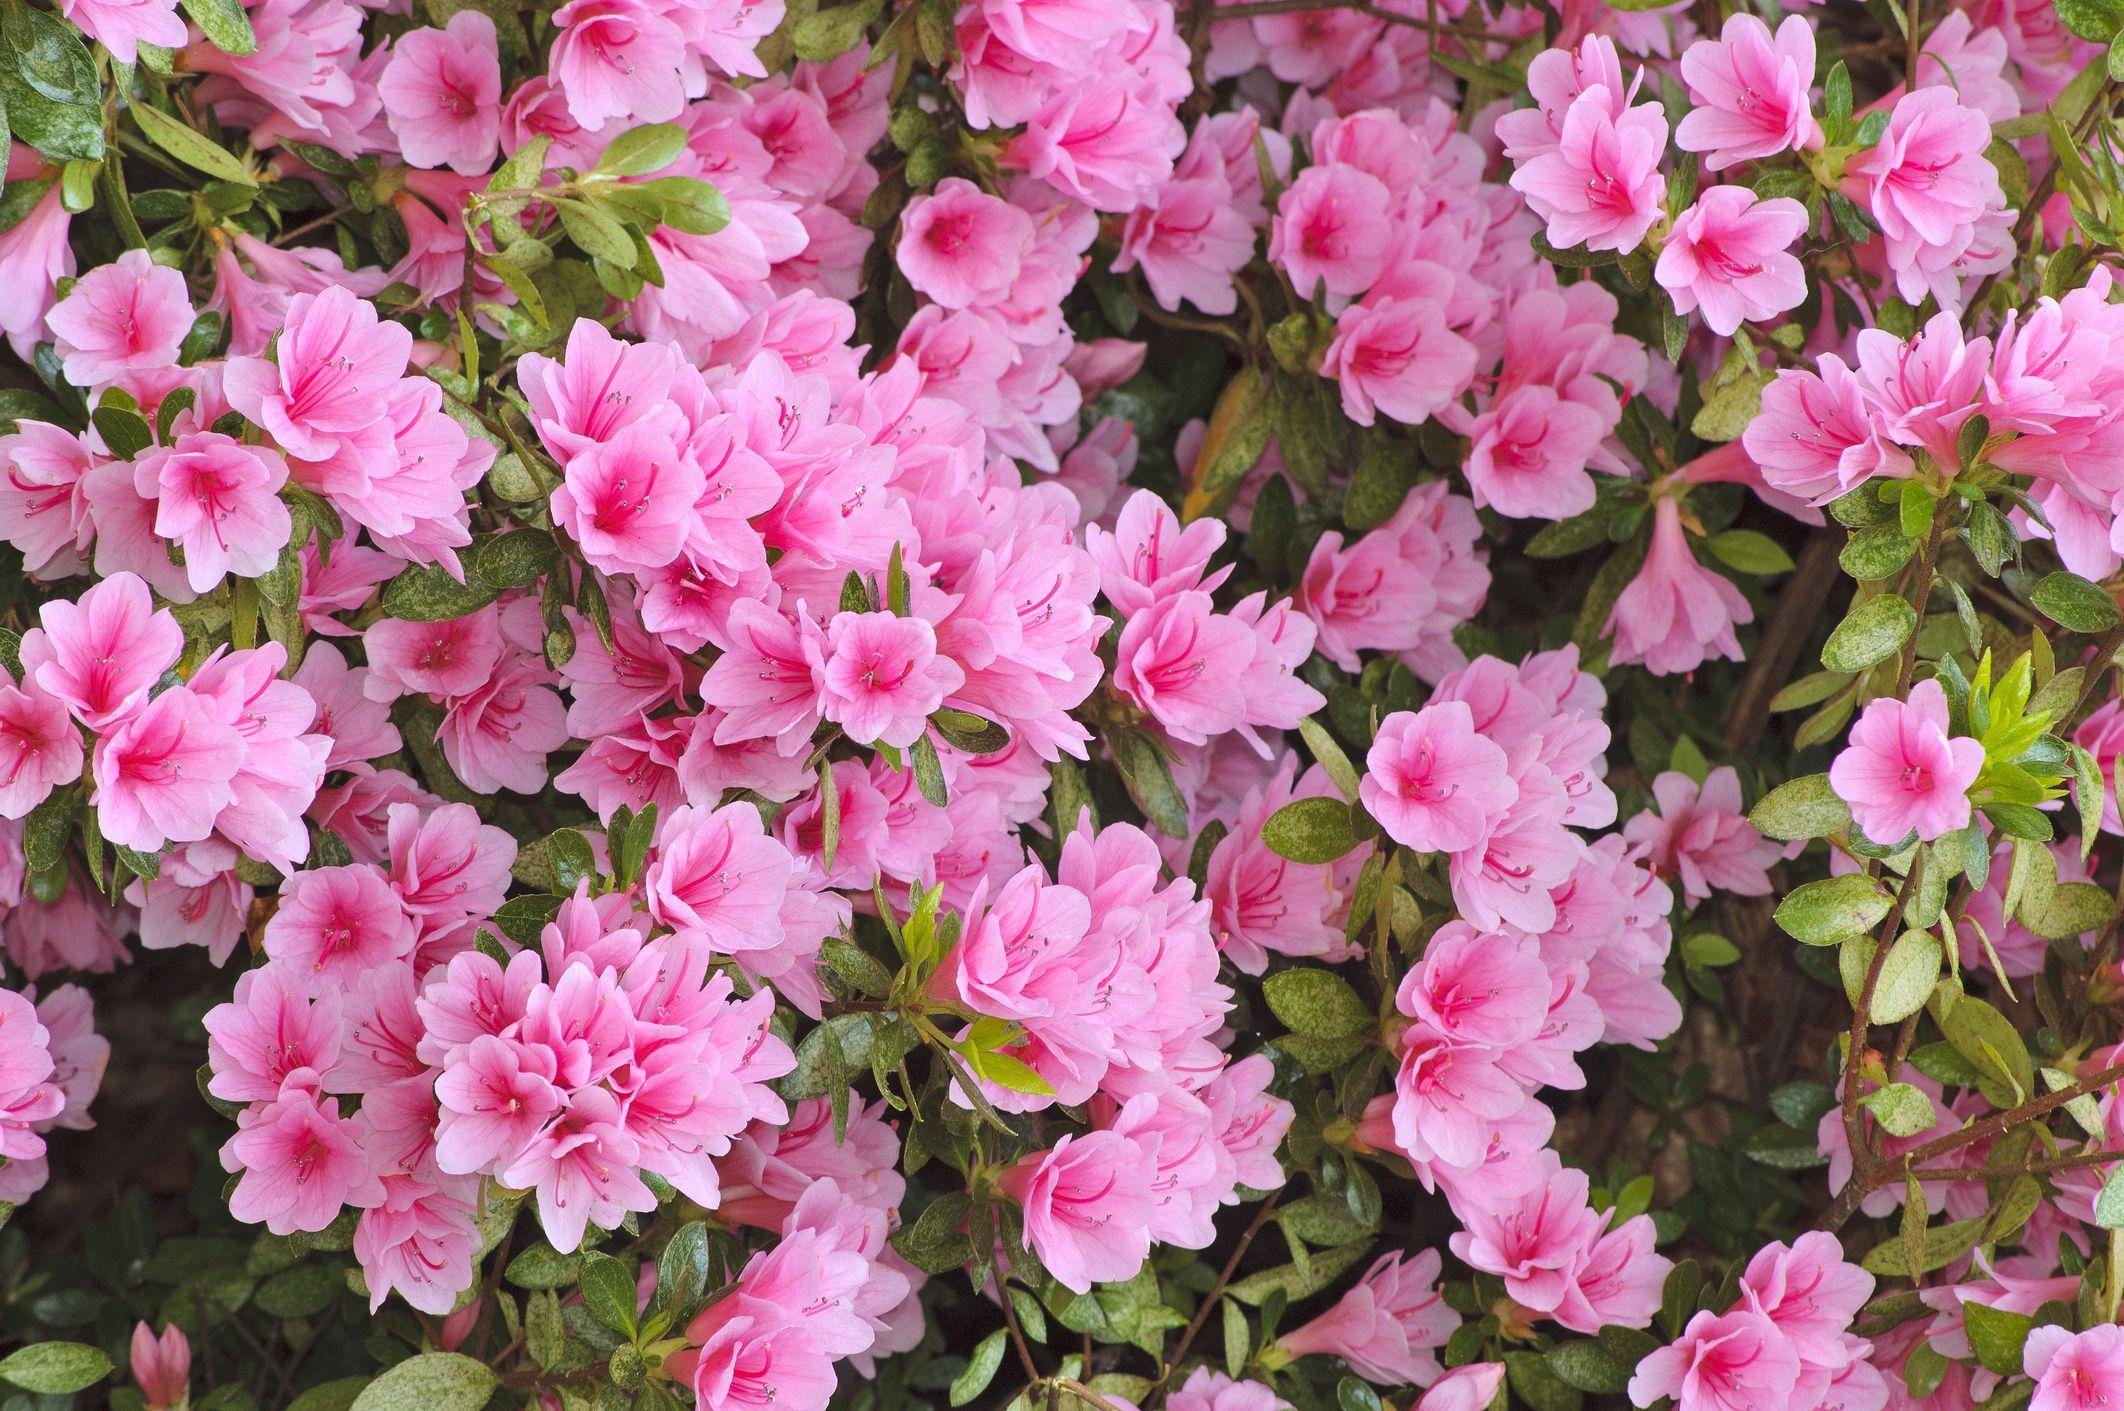 flowering shrubs - blooming